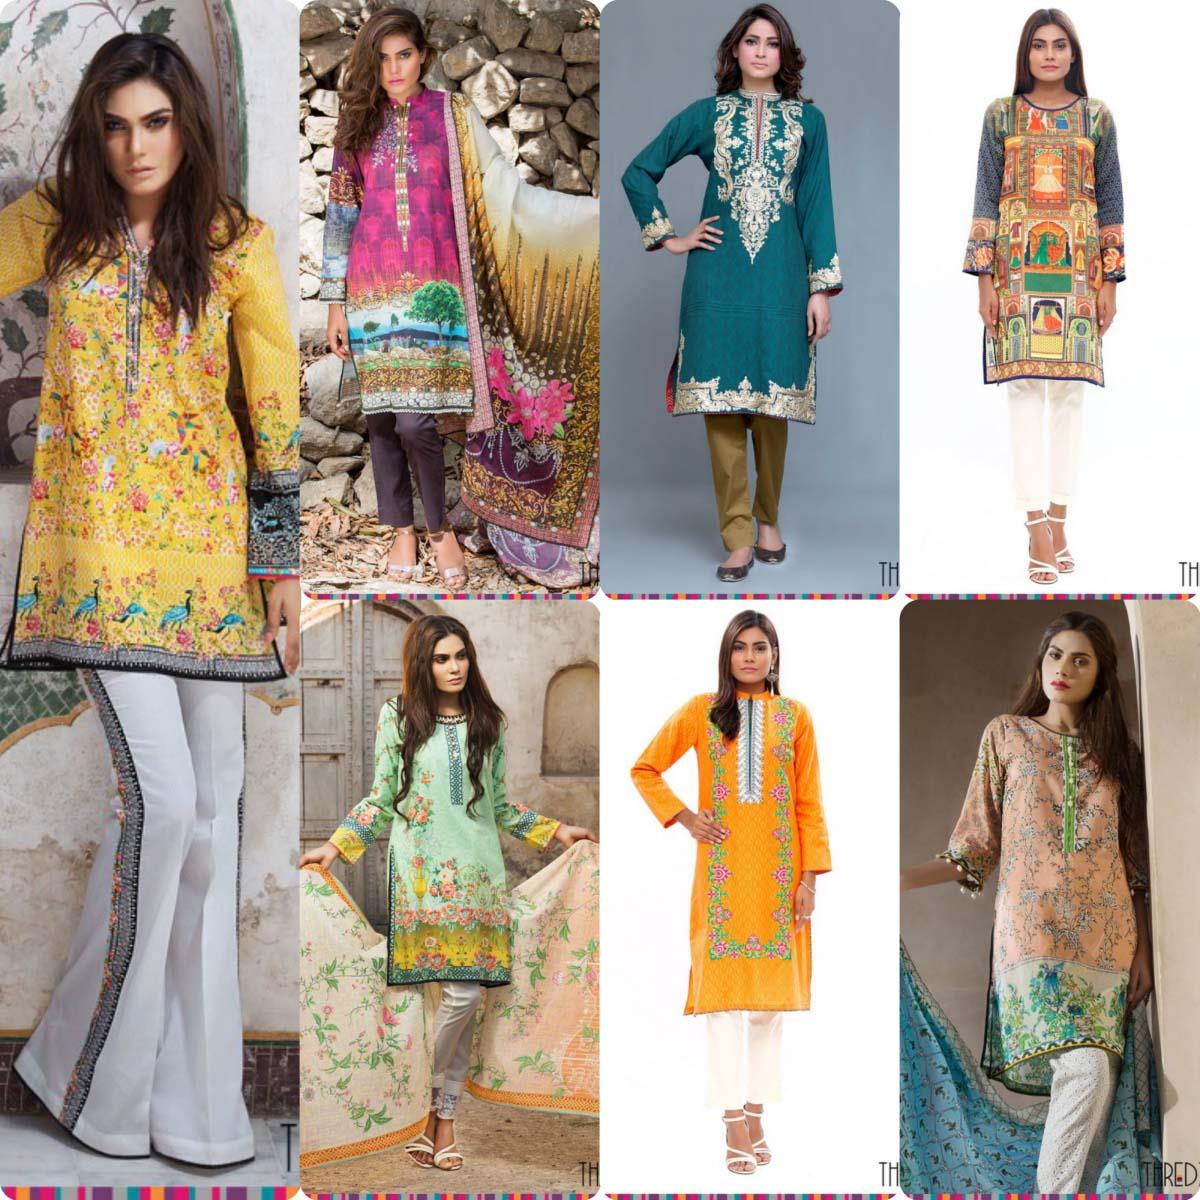 e08f0f50bbaf Latest Thredz Eid Collection for Women 2016